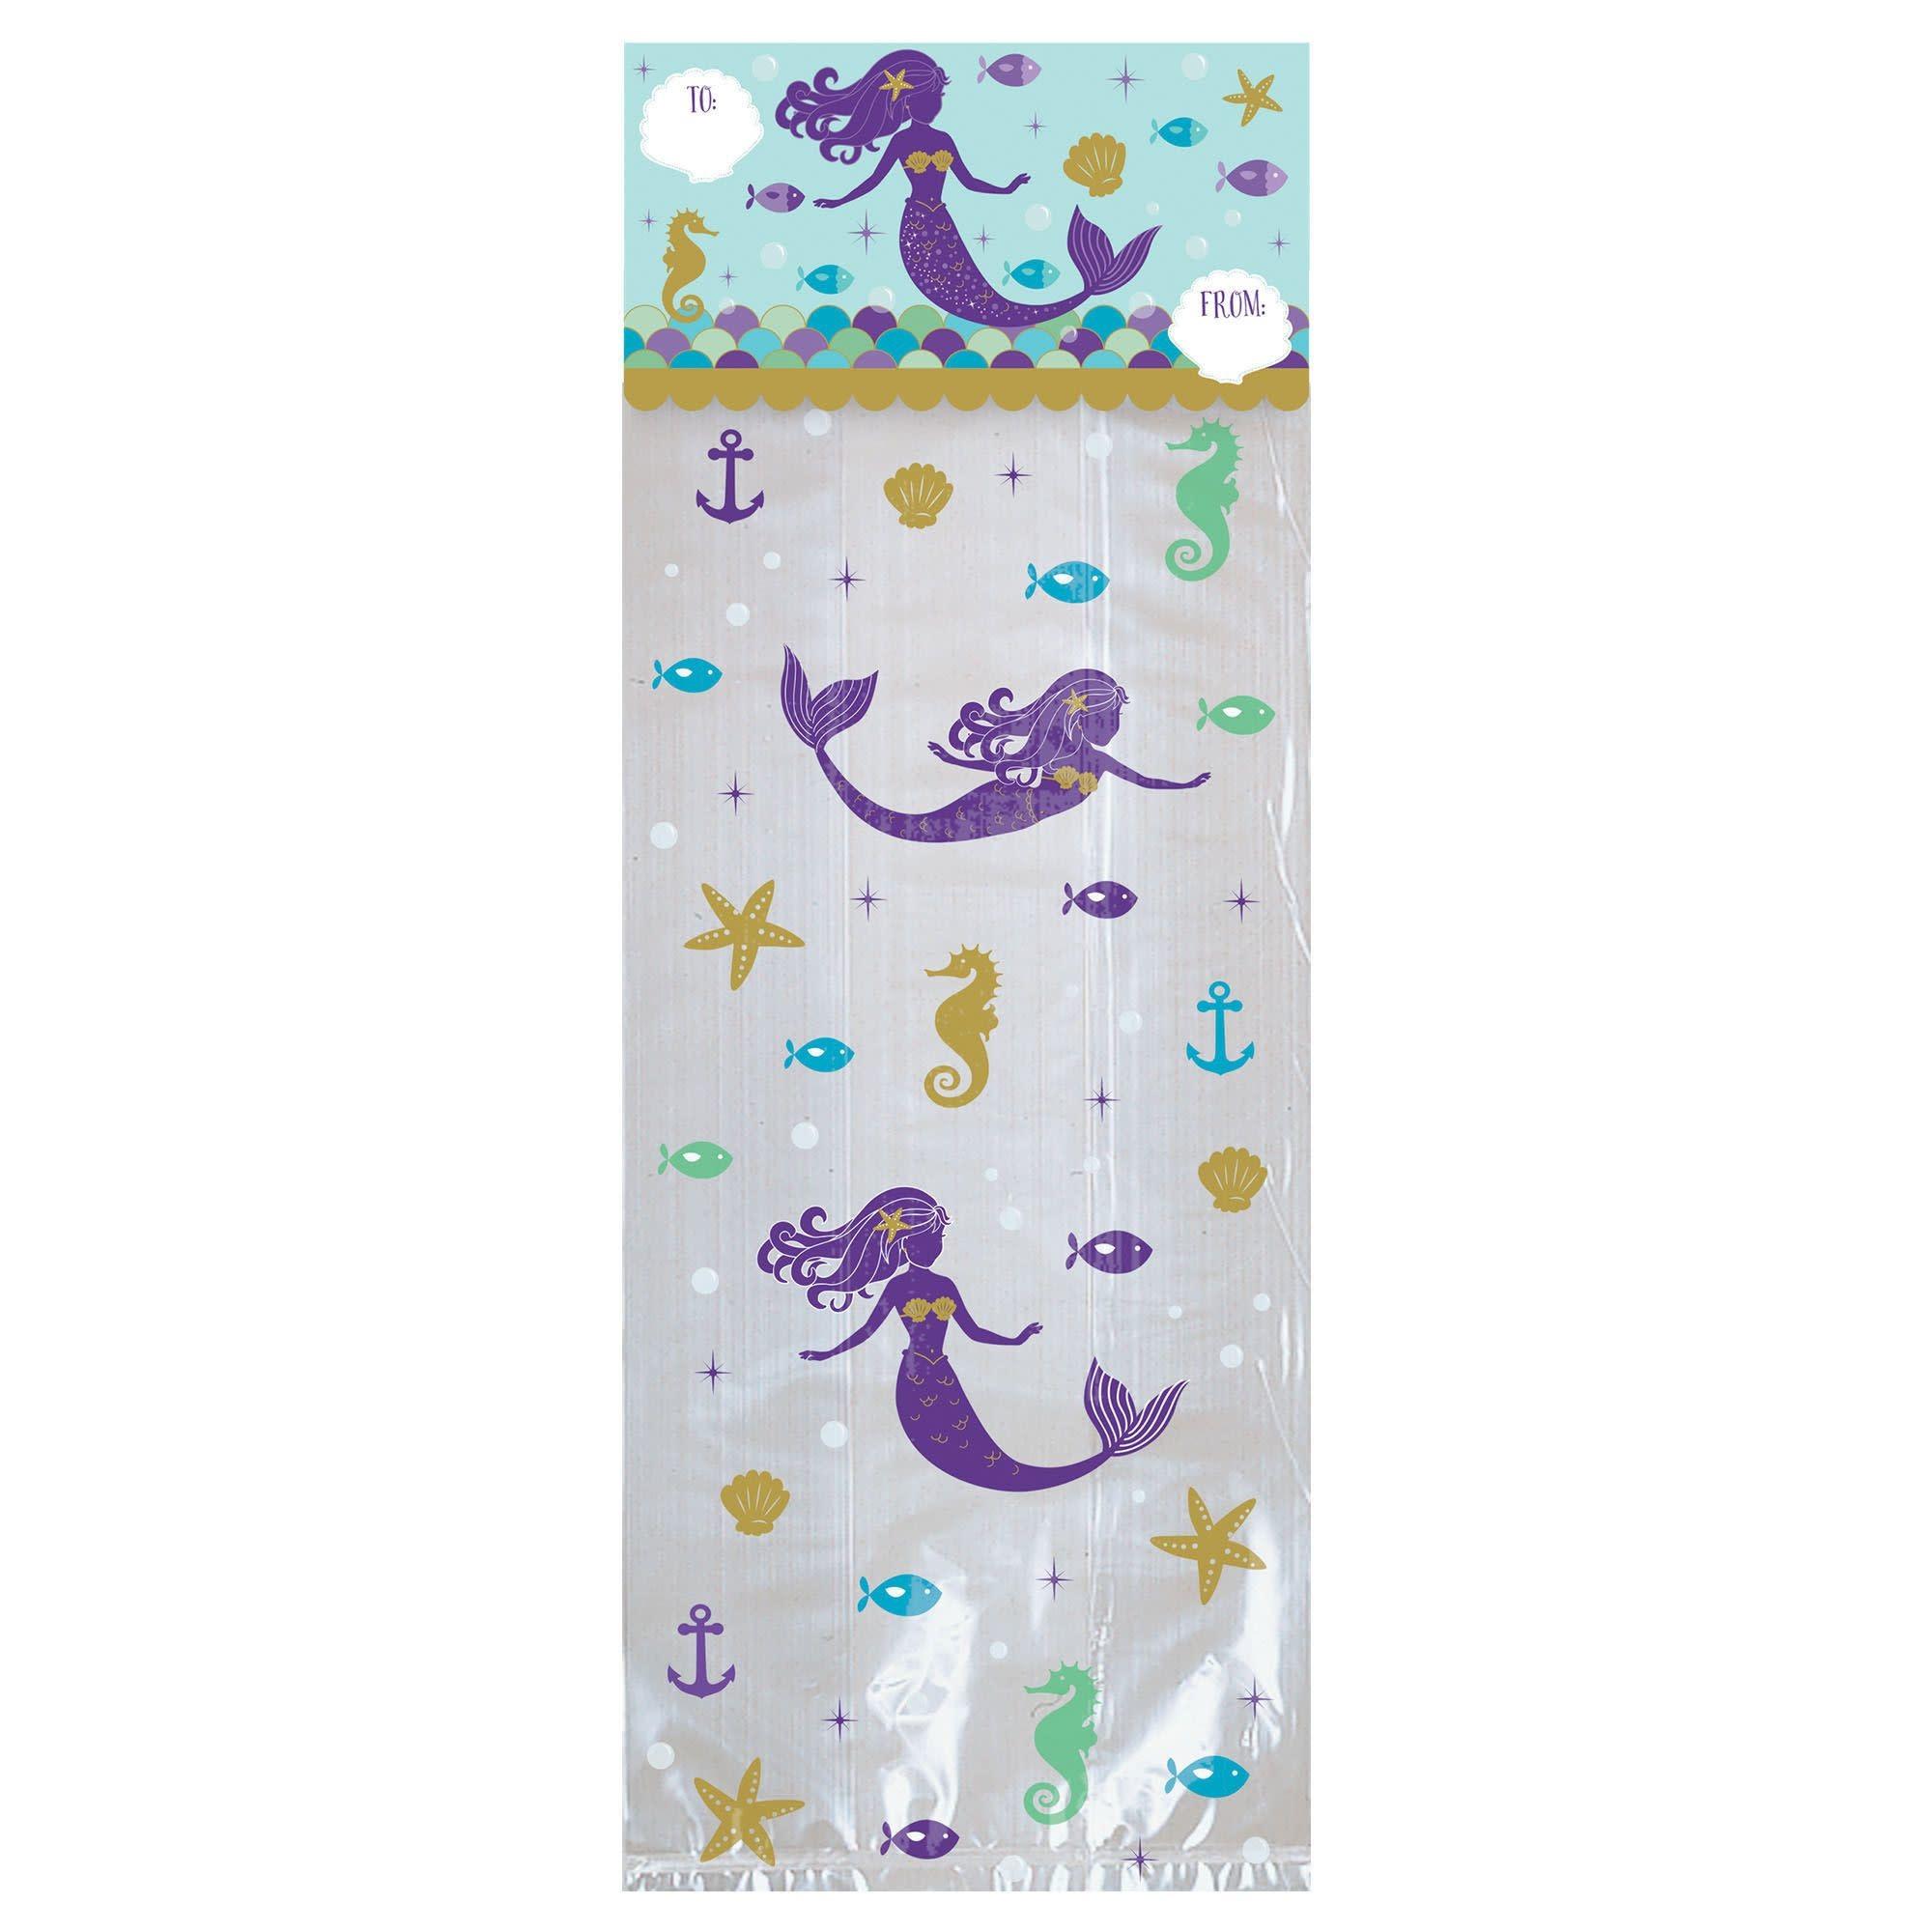 Mermaid Wishes Treat Bags Kit